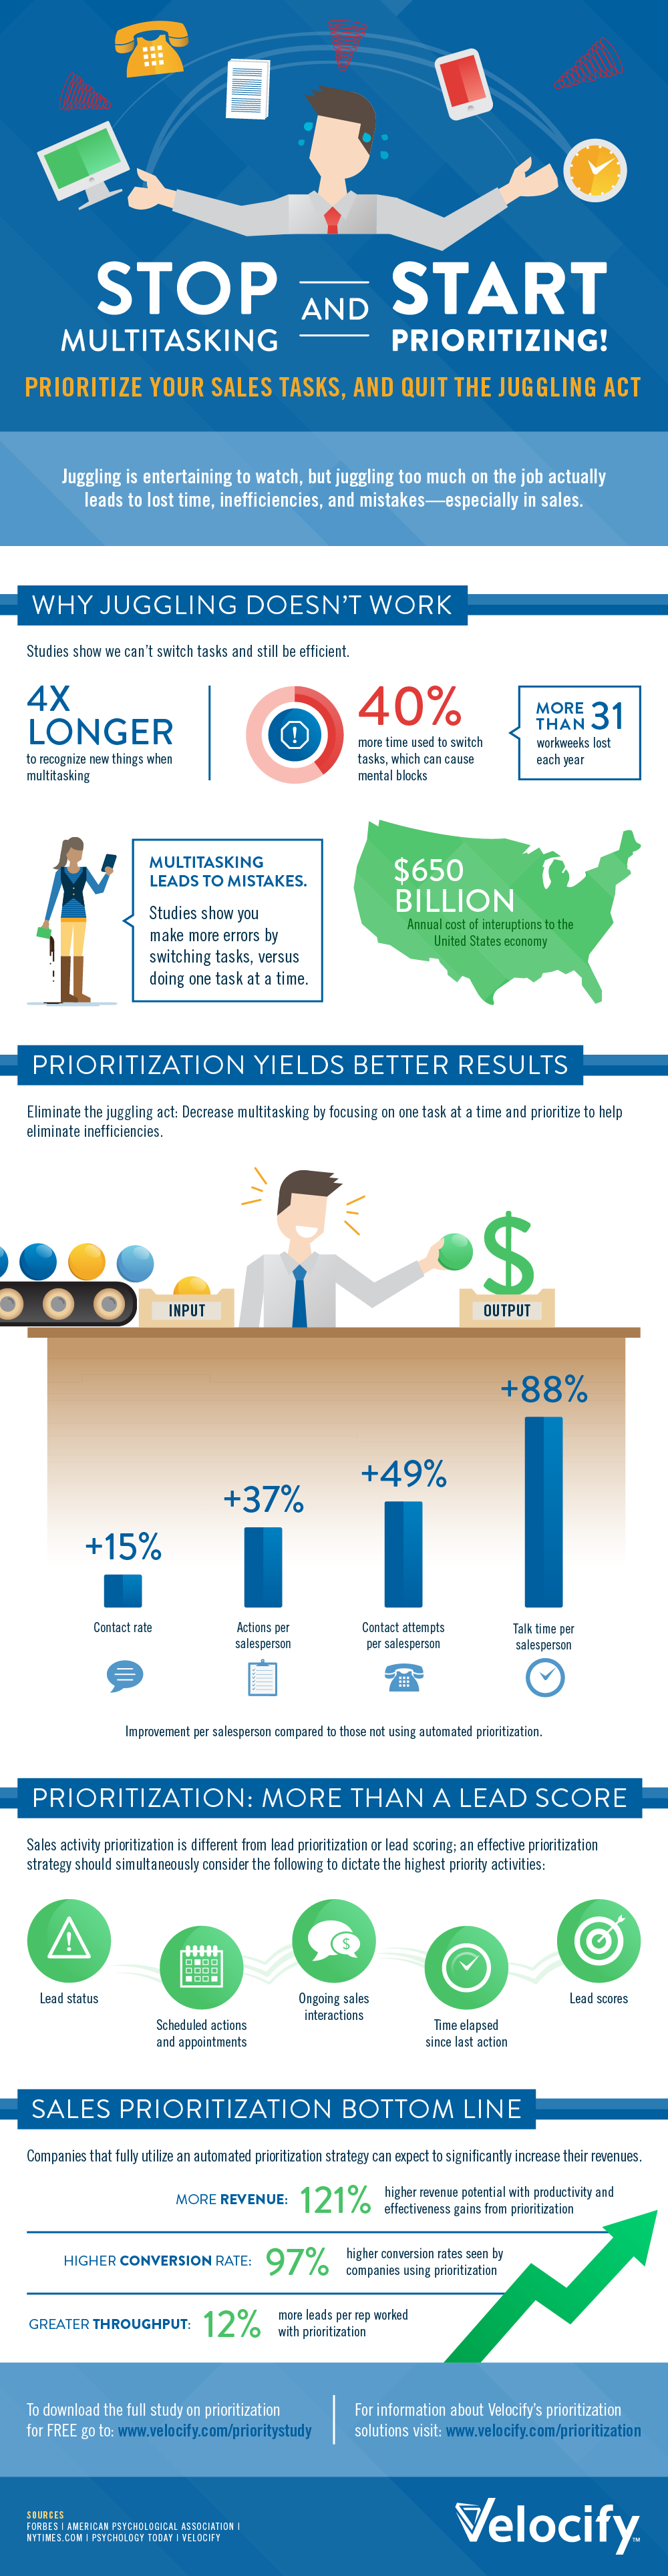 Infographic: Stop Multitasking and Start Prioritizing